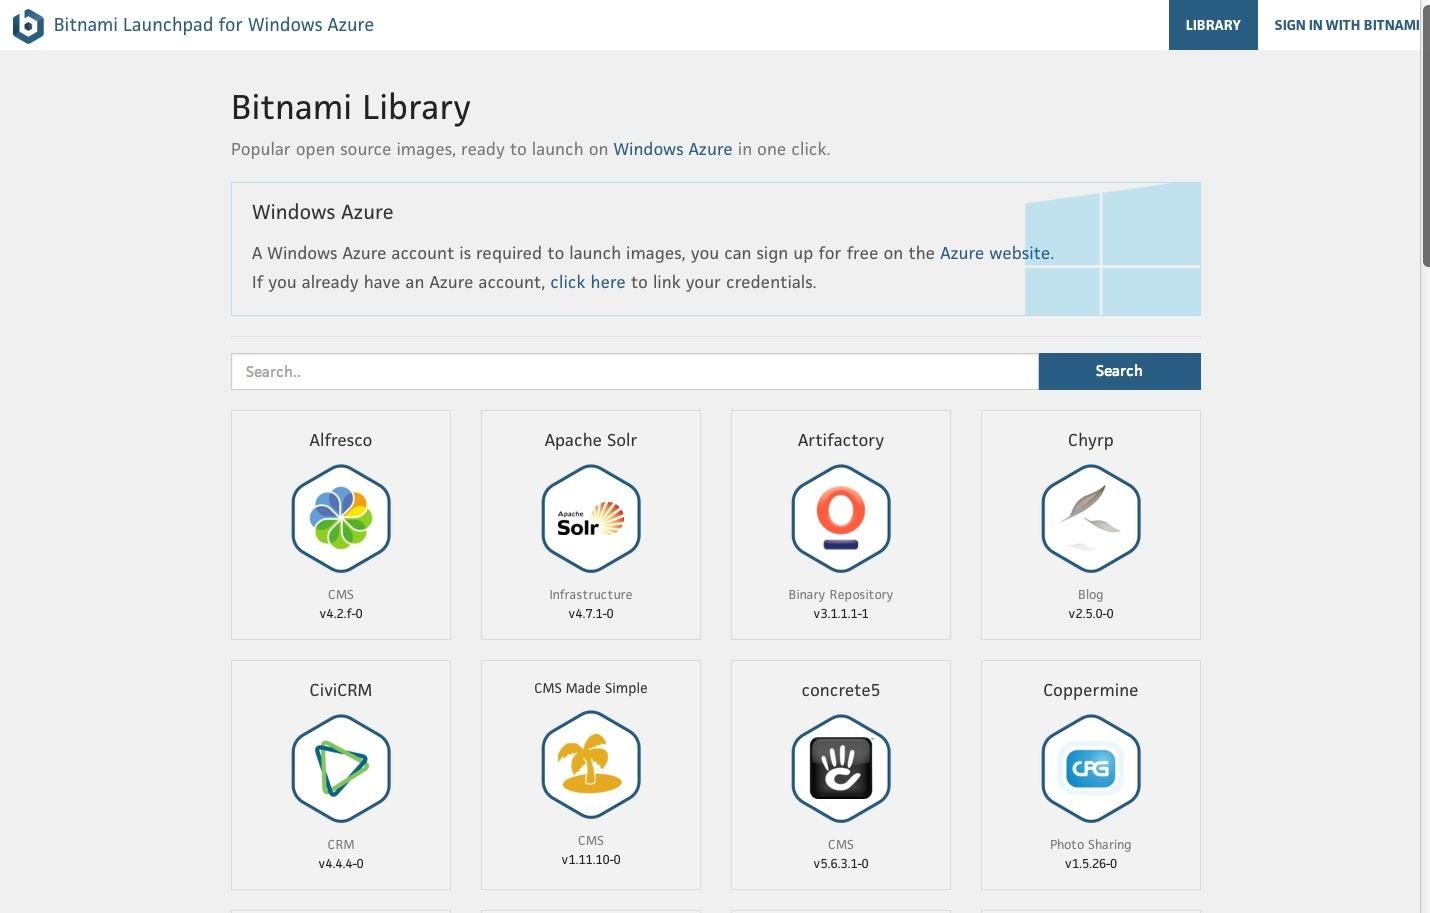 Netreo Vs Bitnami - Azure Monitoring Tool